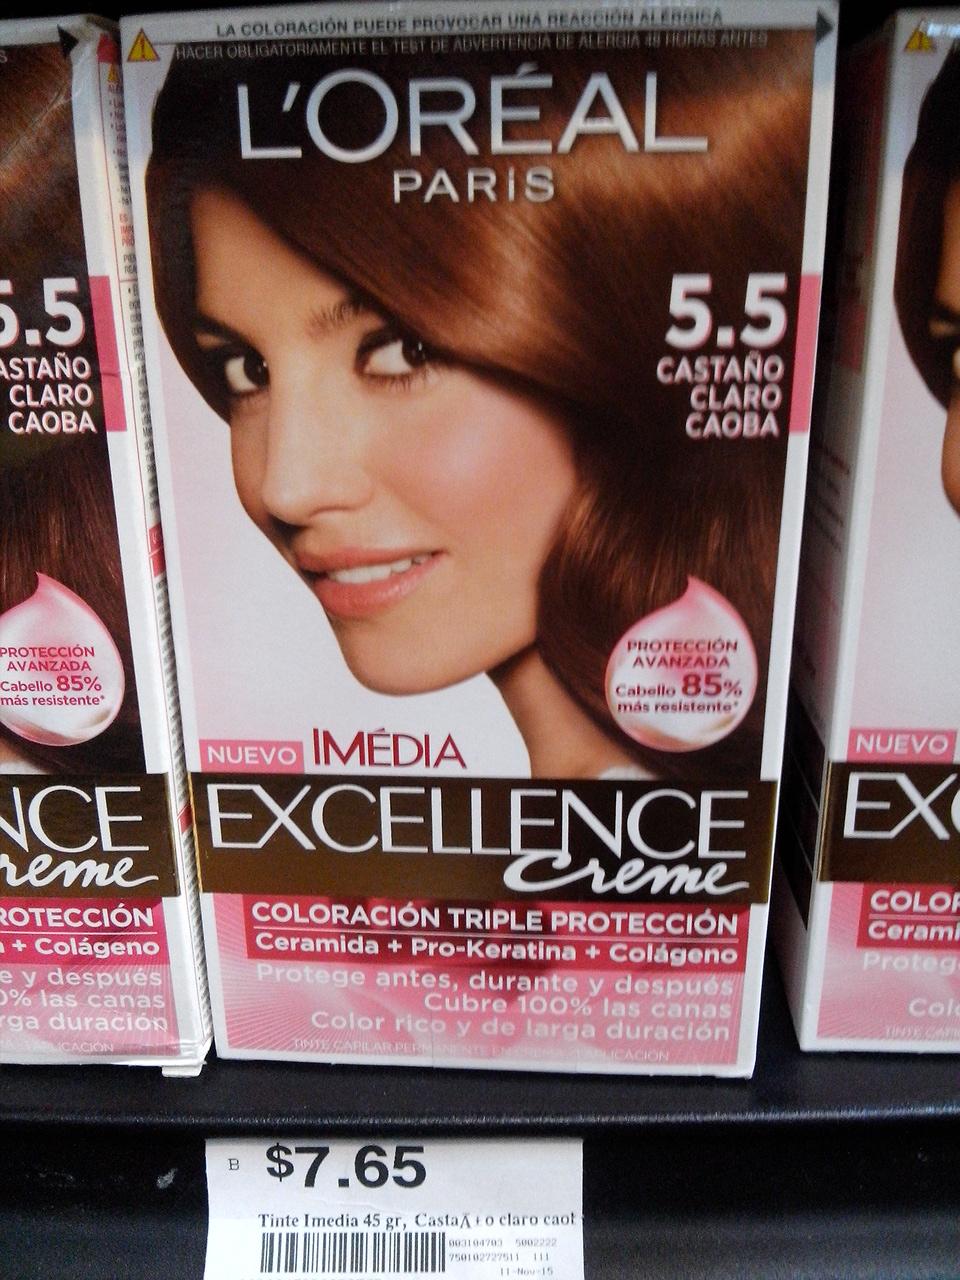 Chedraui (Guadalajara): tinte Imédia Excellence $7.65